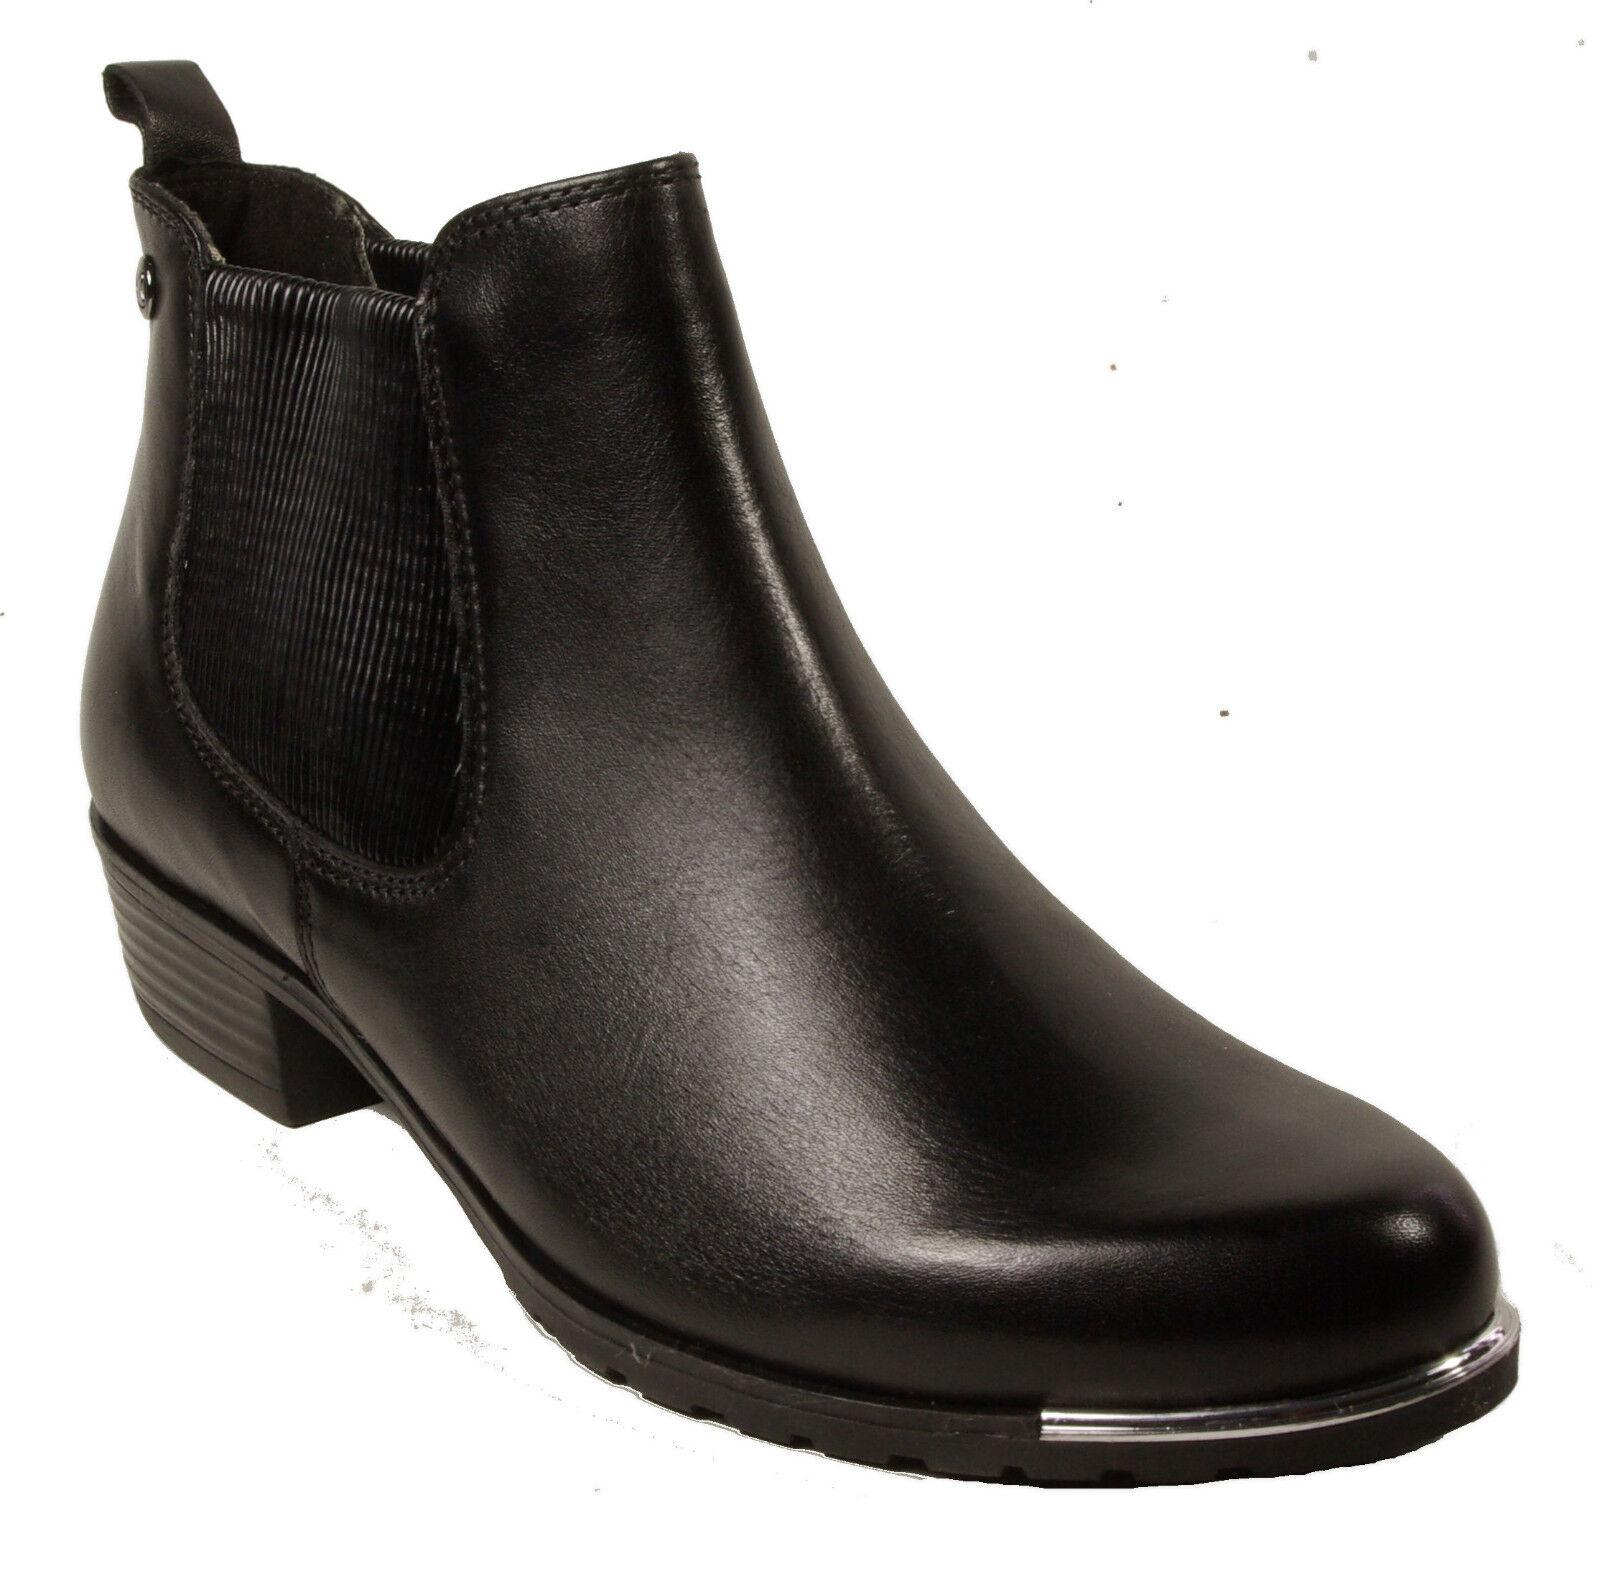 Grandes zapatos con descuento CAPRICE Schuhe Chelsea Boots Stiefeletten Schwarz echt Leder NEU